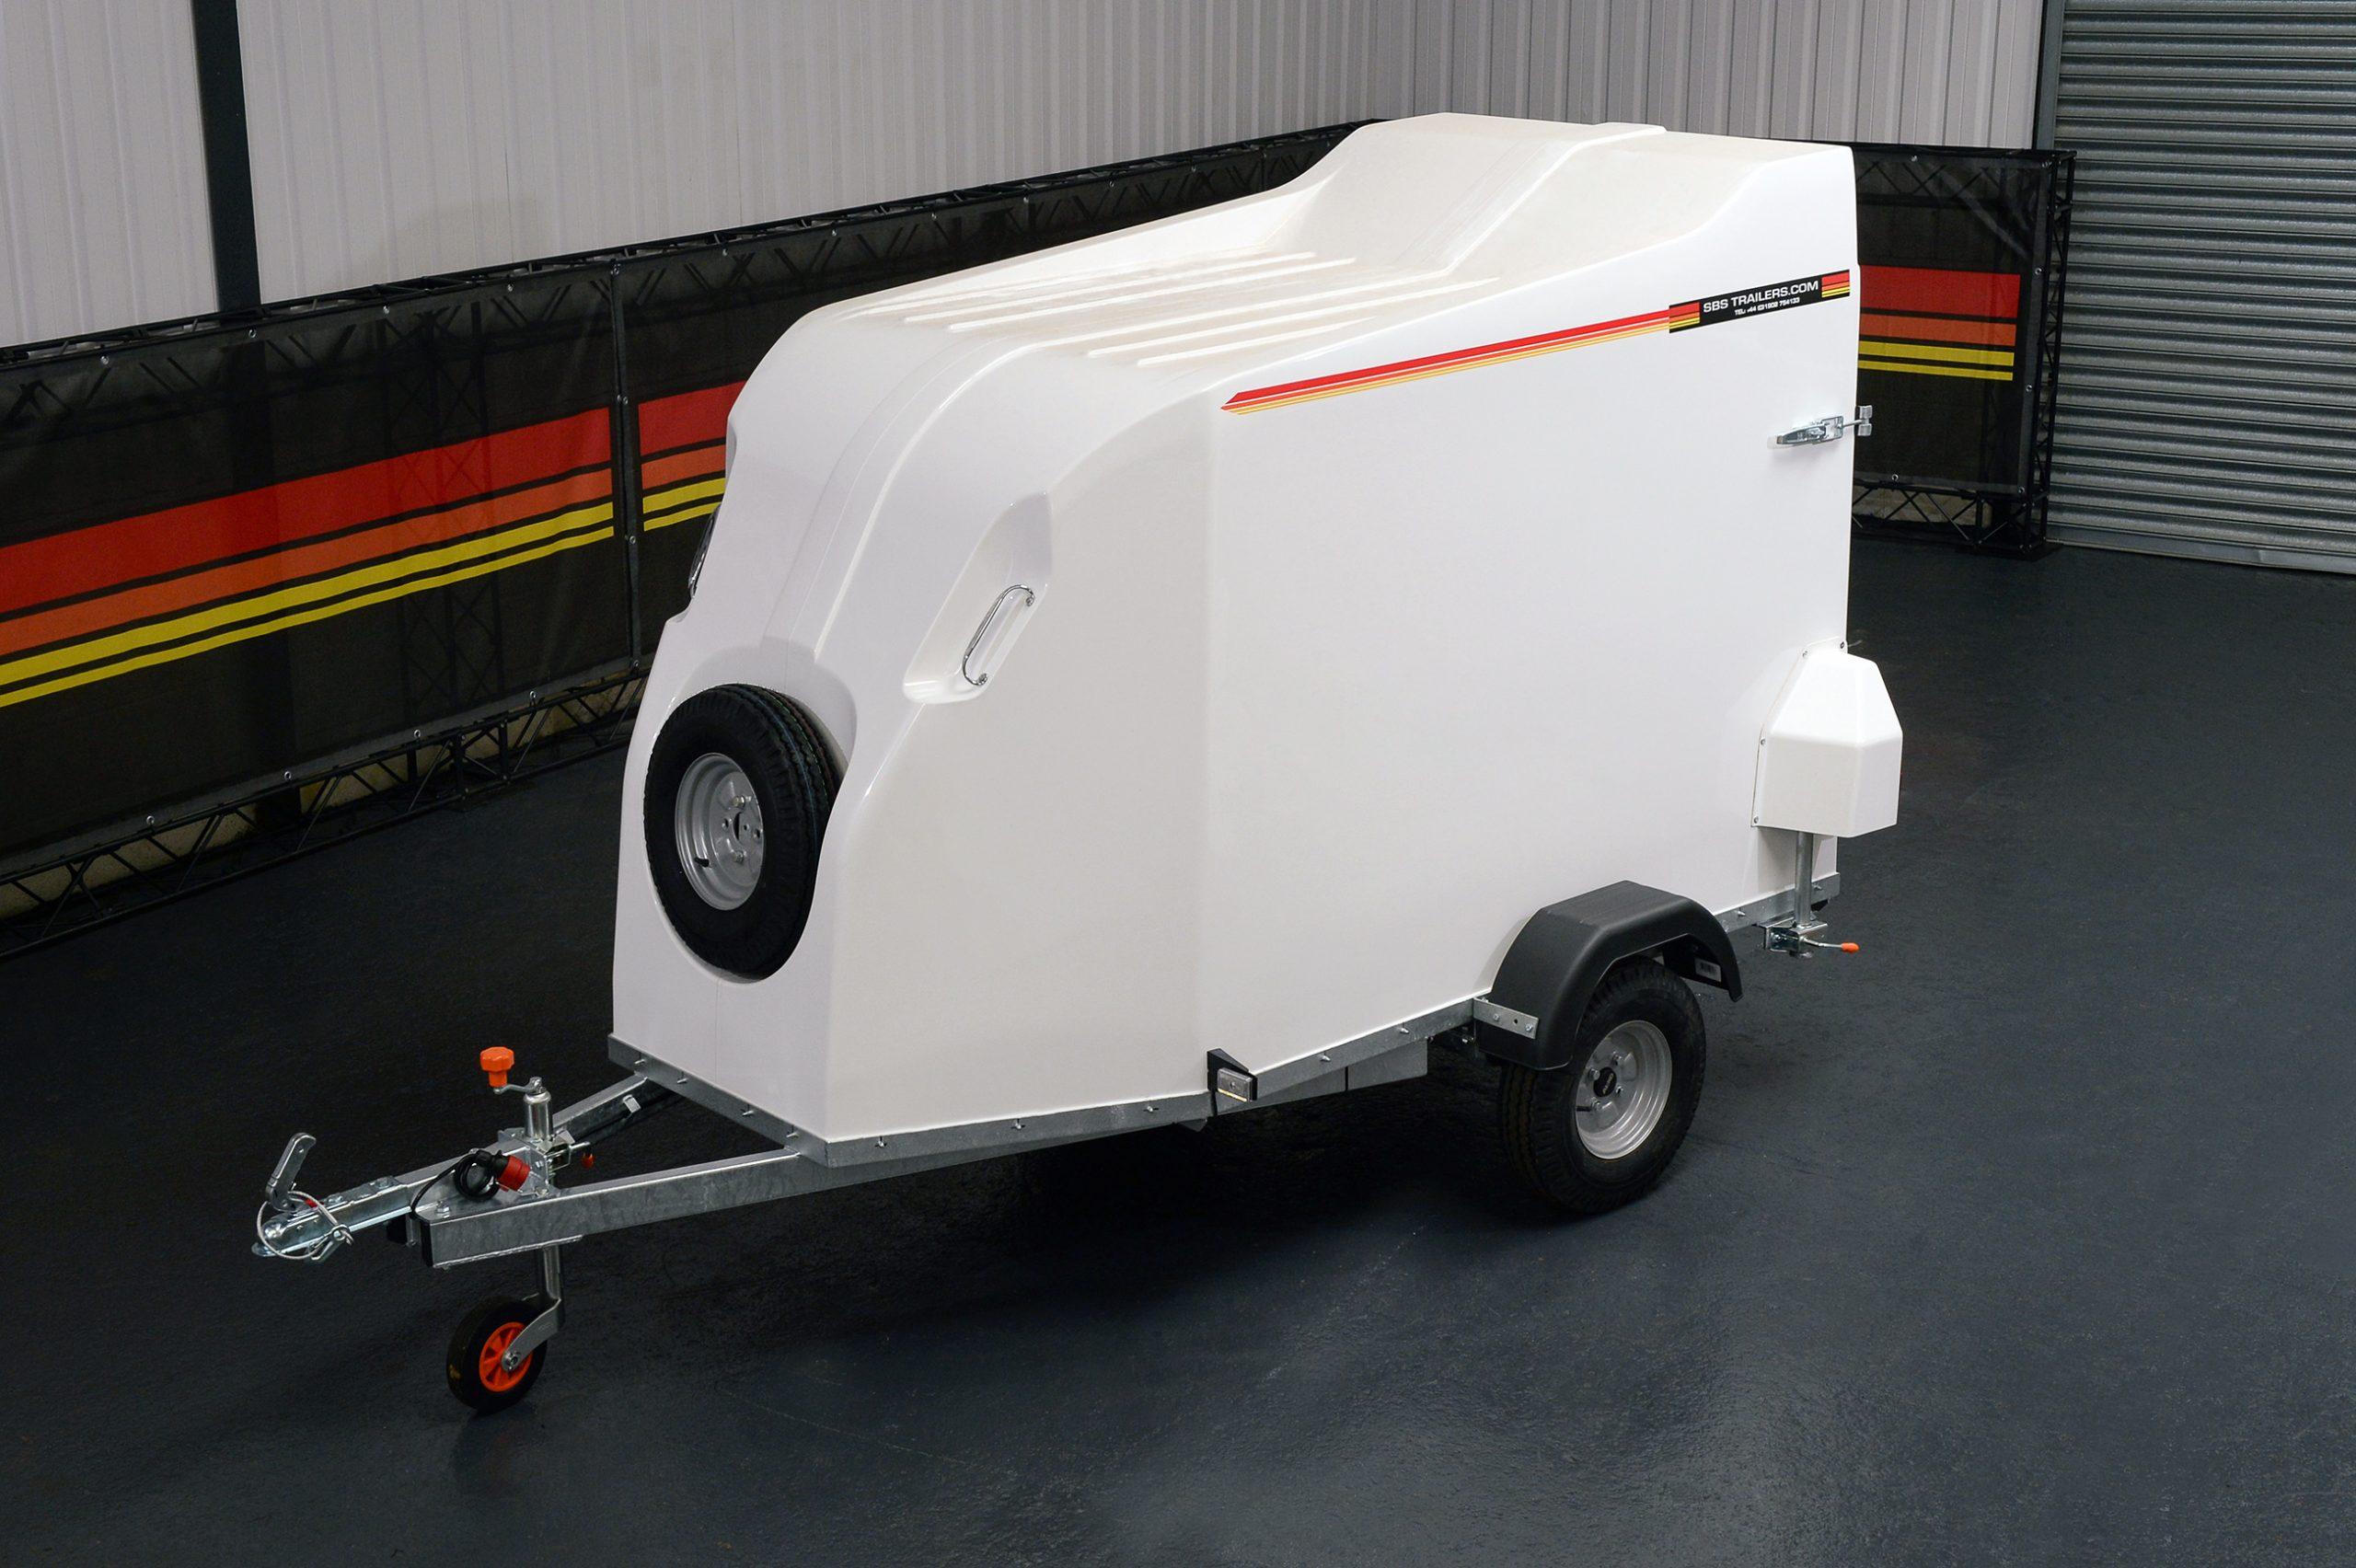 TVA750 Trailer Van from SBS Trailers Ltd